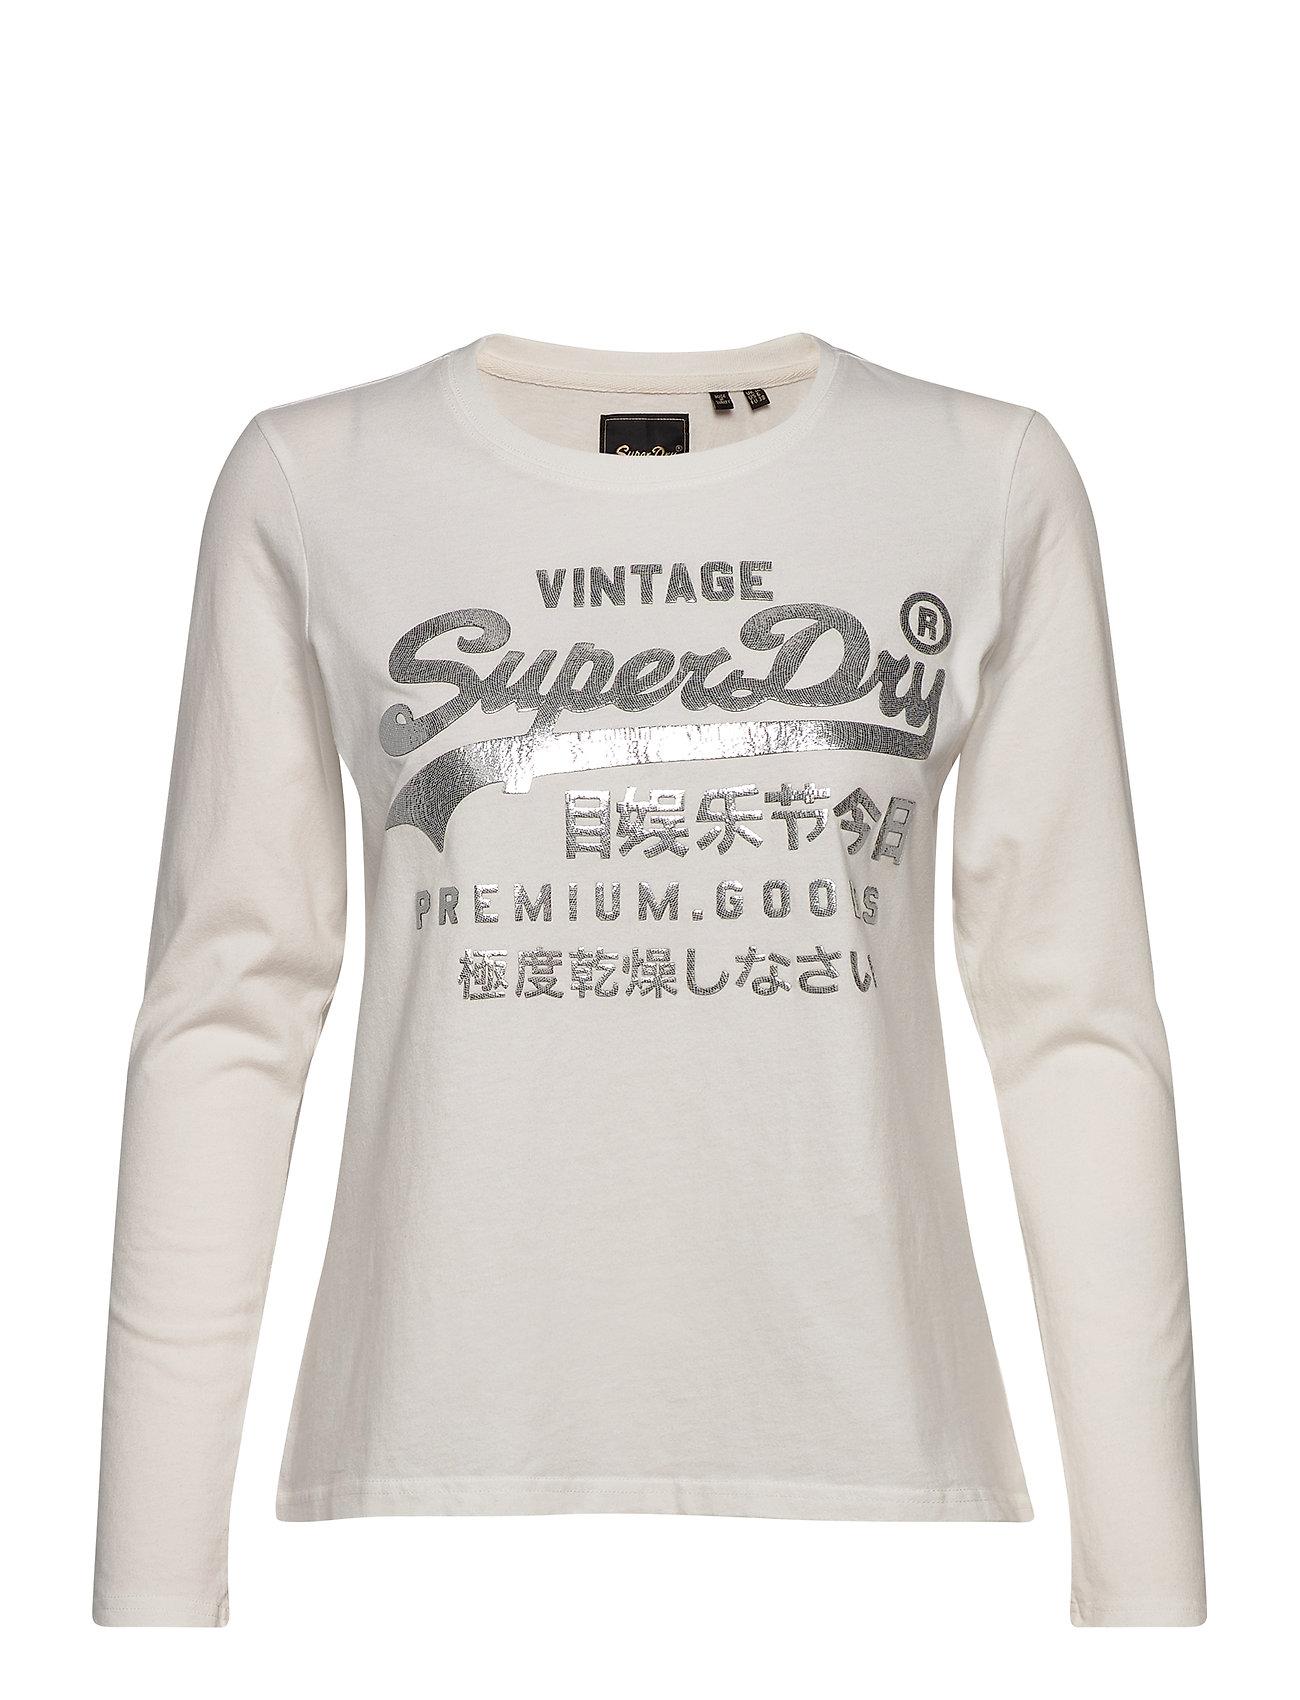 Image of Premium Goods Metallic Ls Top Langærmet T-shirt Creme Superdry (3428005811)